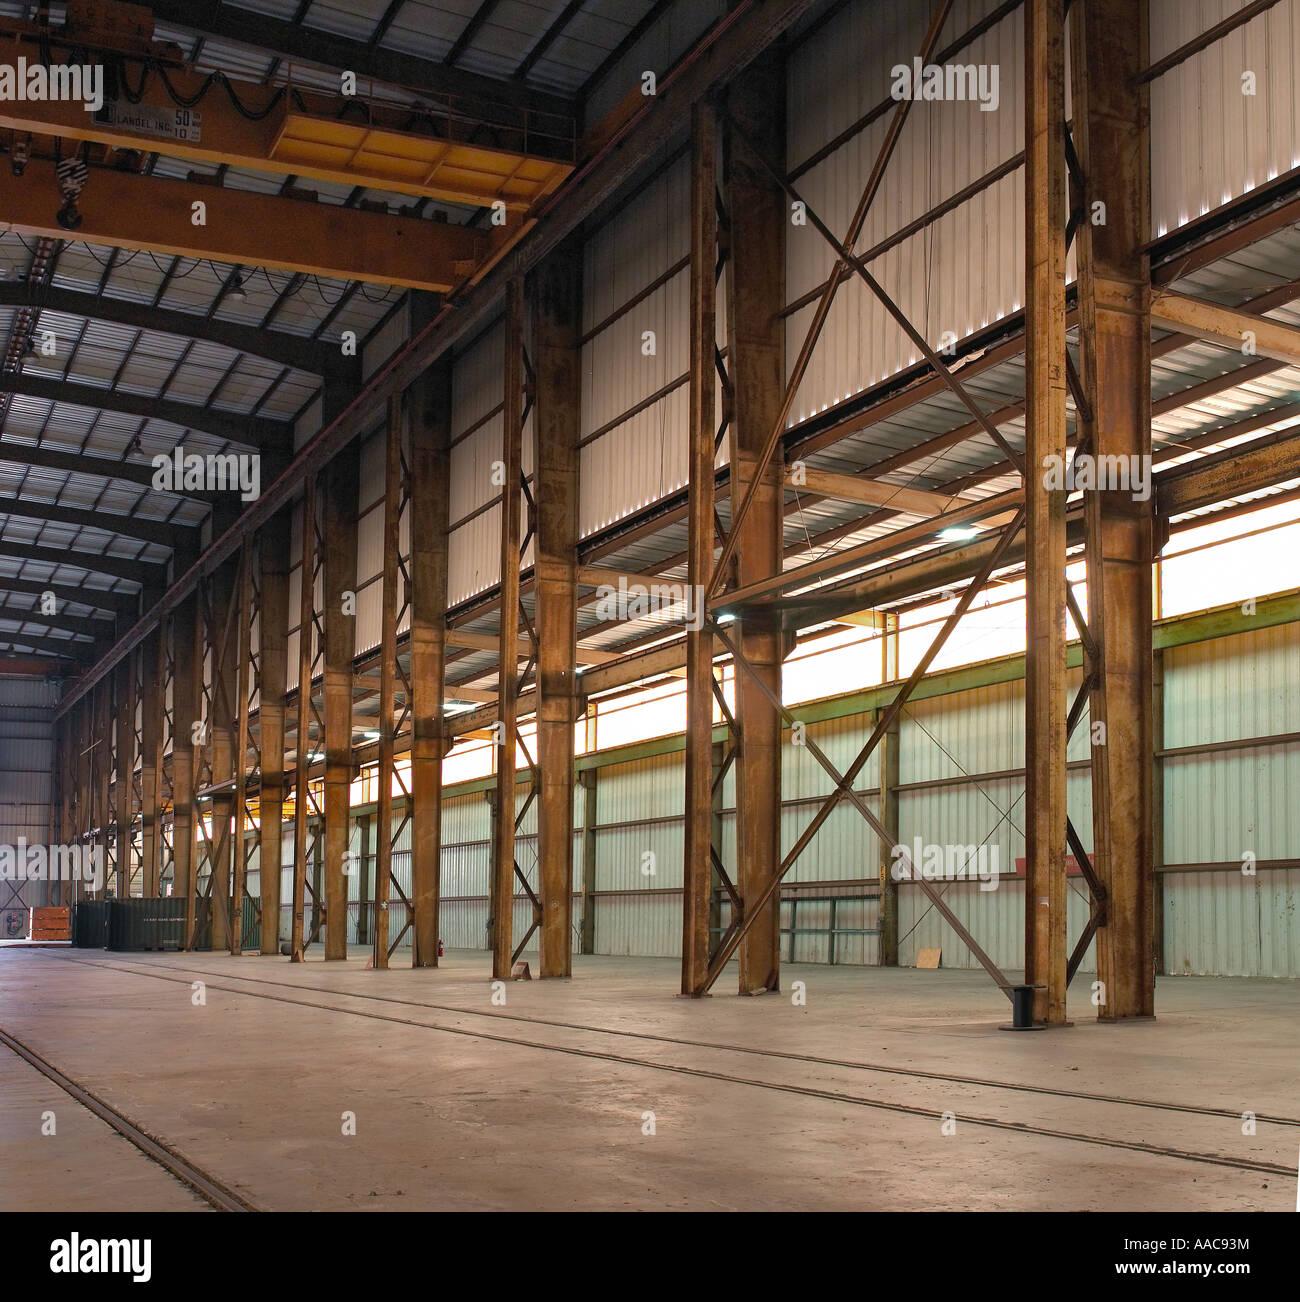 Rusty Beams Girders Inside Old Empty Warehouse Usa Stock